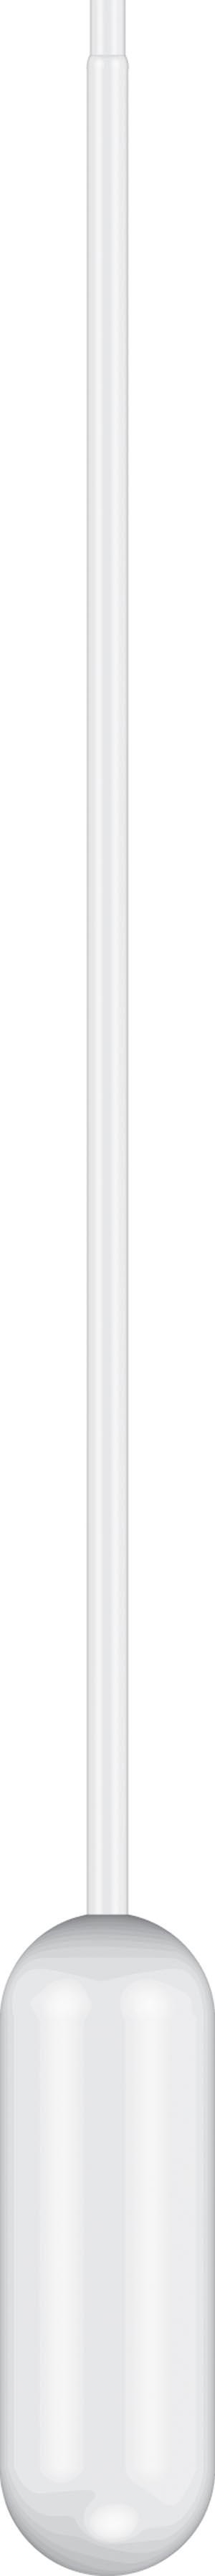 Pipet, 15.5m Length, 4mL Capacity, Non-Sterile, 500/pk, 10 pk/cs